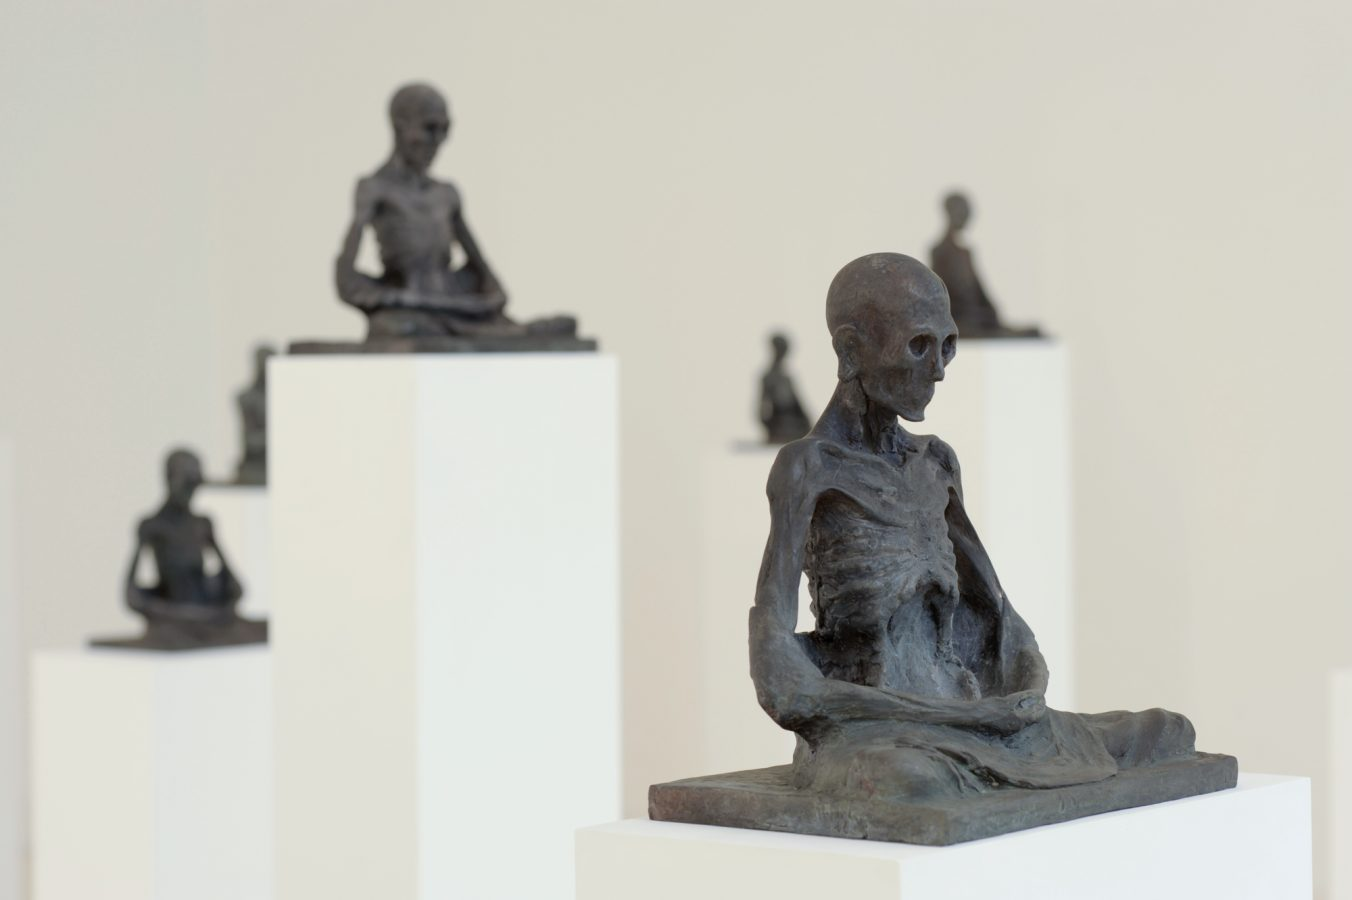 Galeria Pedro Cera – Miguel Branco -